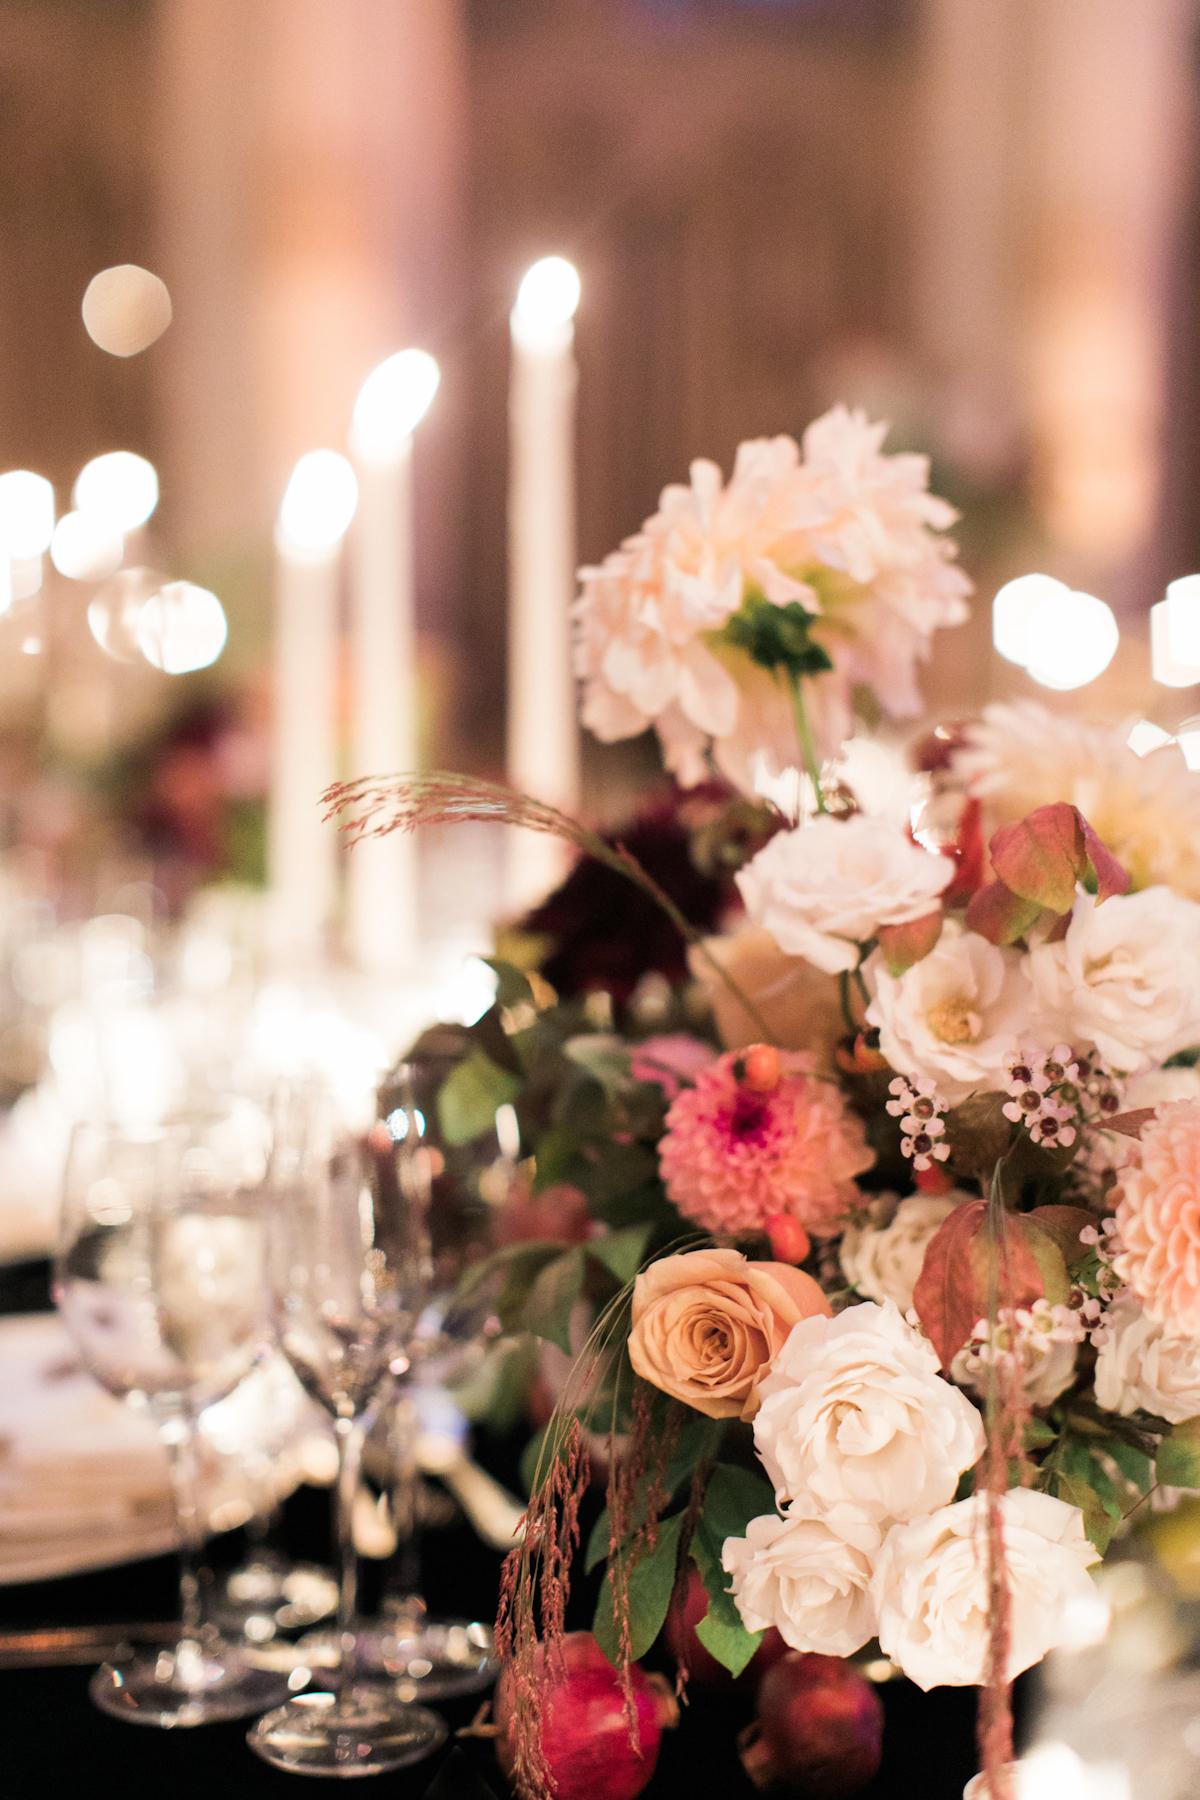 Plaza wedding flowers